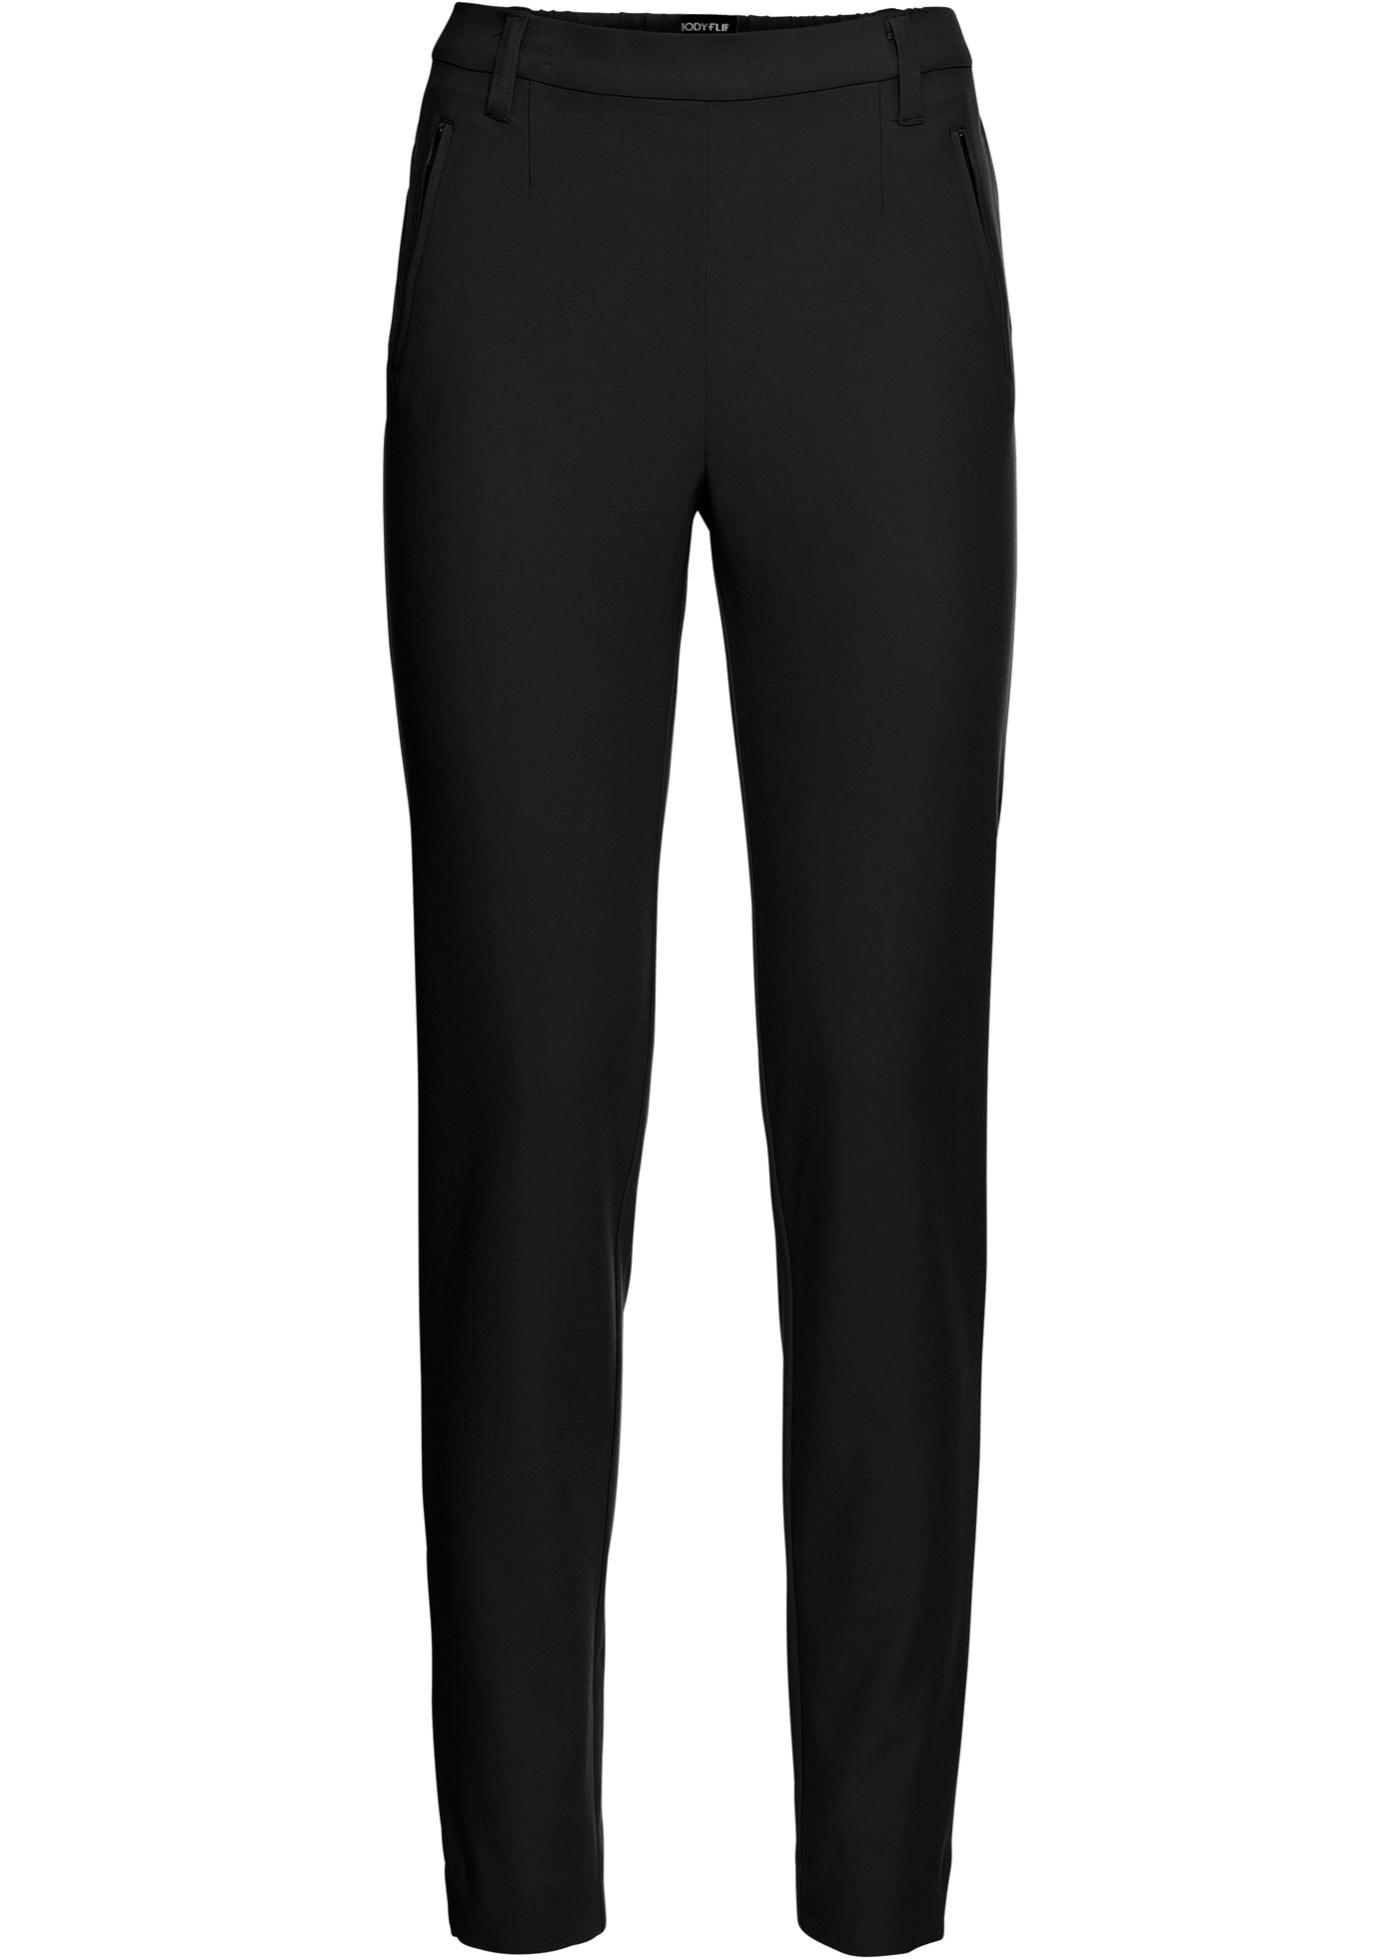 Pantalone business con elastico (Nero) - BODYFLIRT